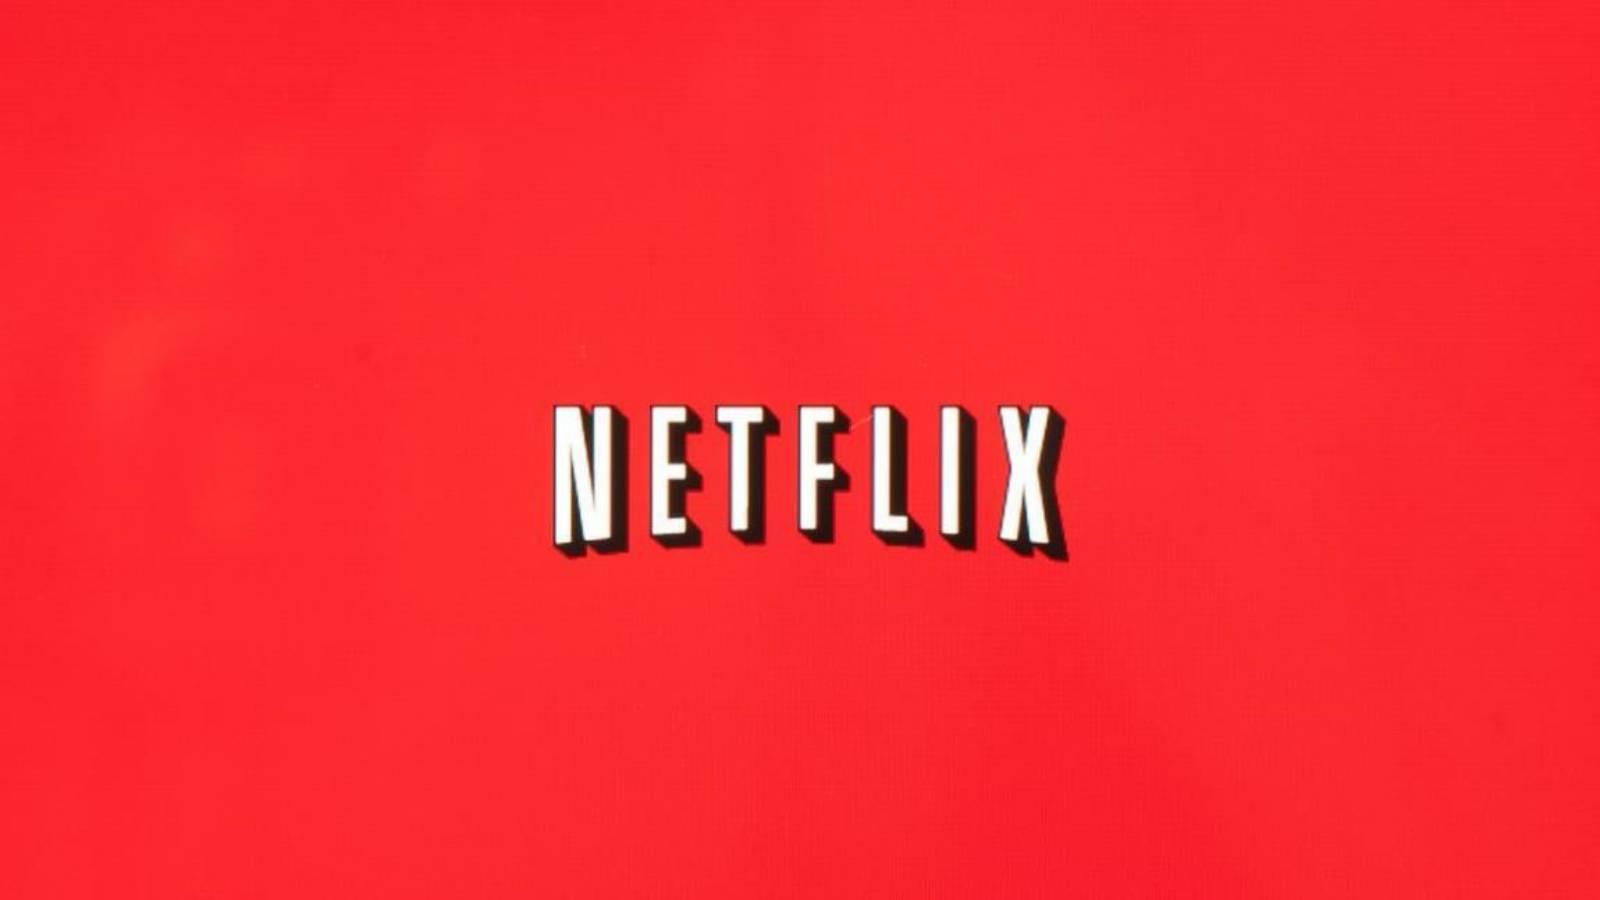 Netflix originale